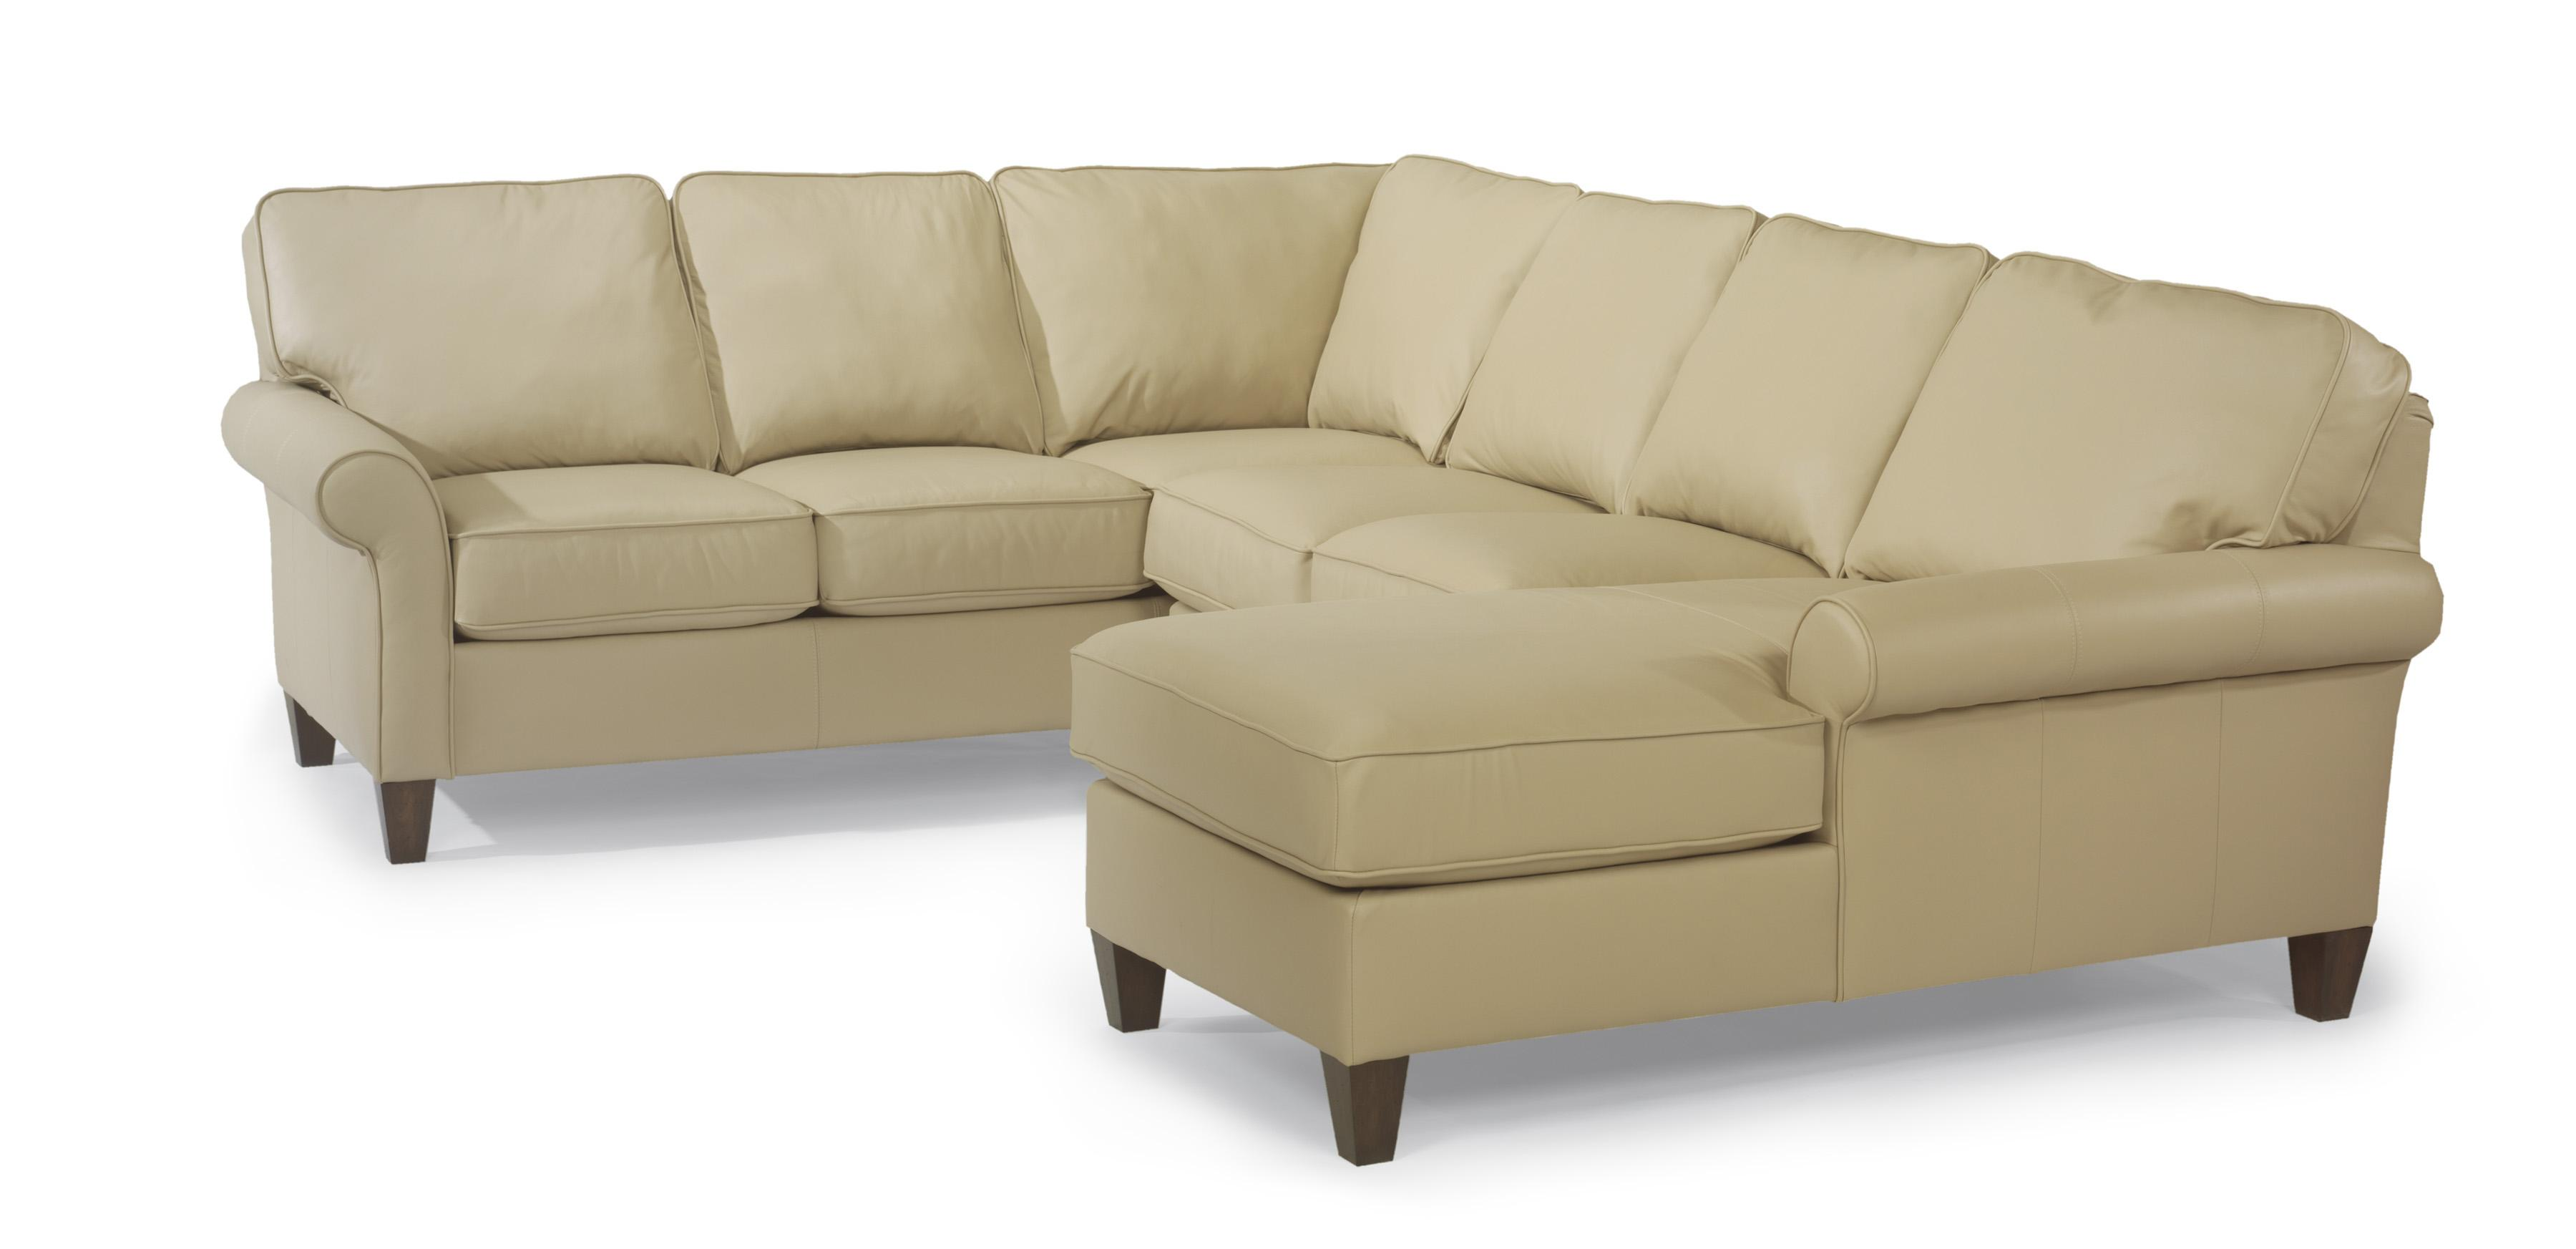 Westside Sectional Sofa by Flexsteel at Mueller Furniture